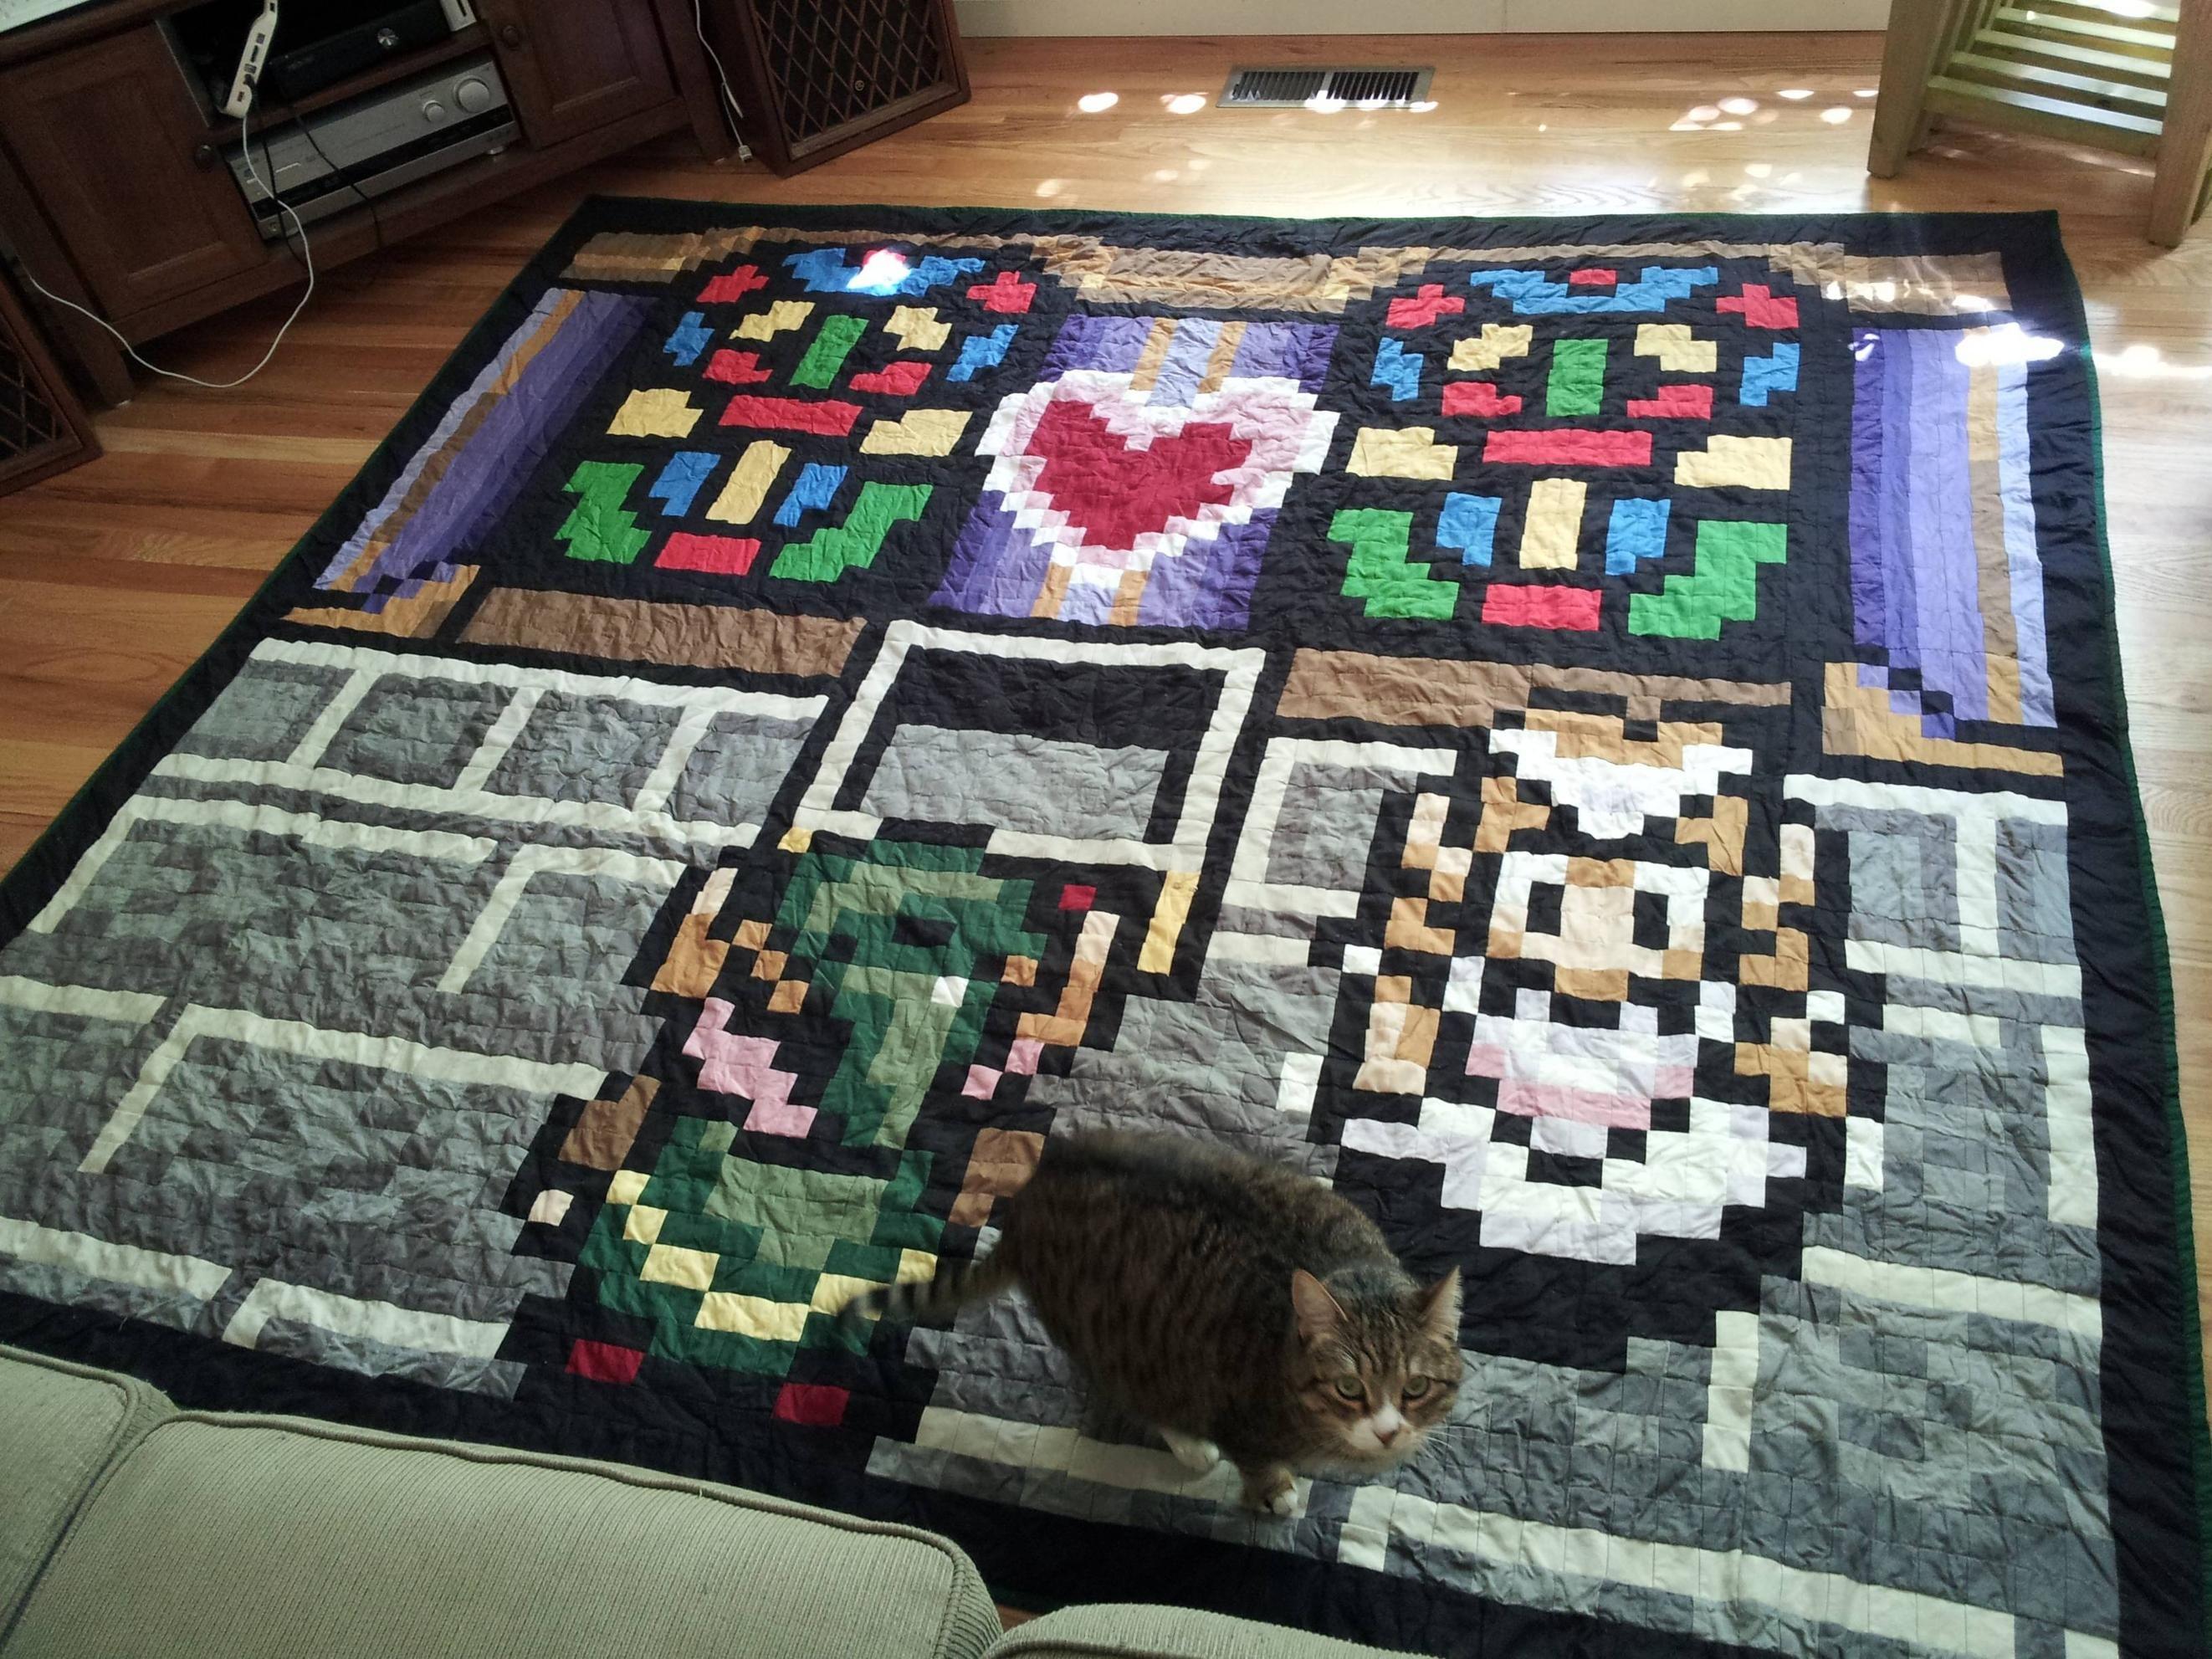 Legend Of Zelda Quilt Wedding Present For Two Gamers